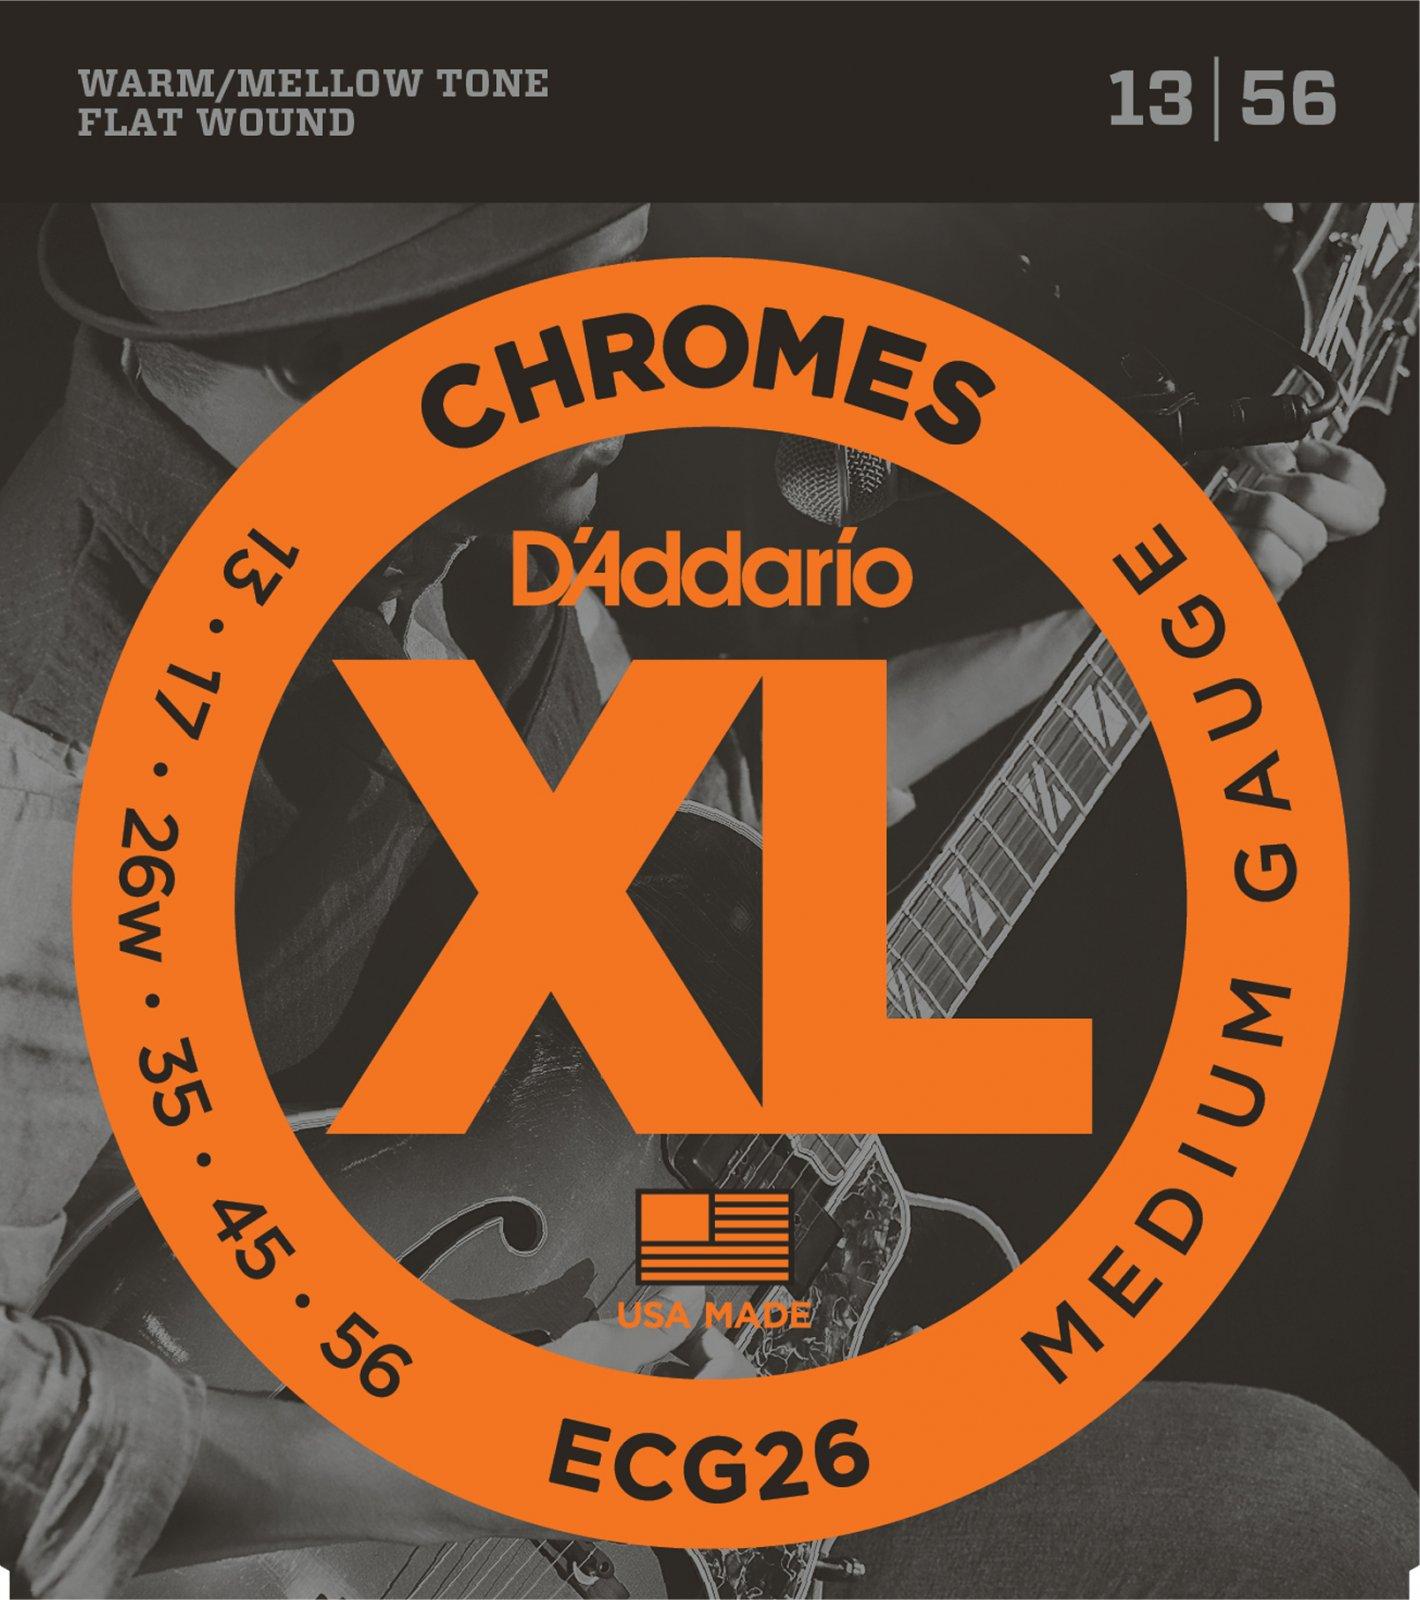 D'Addario XL Chromes ECG26 Flat Wound Electric Guitar Strings, Medium, 13-56